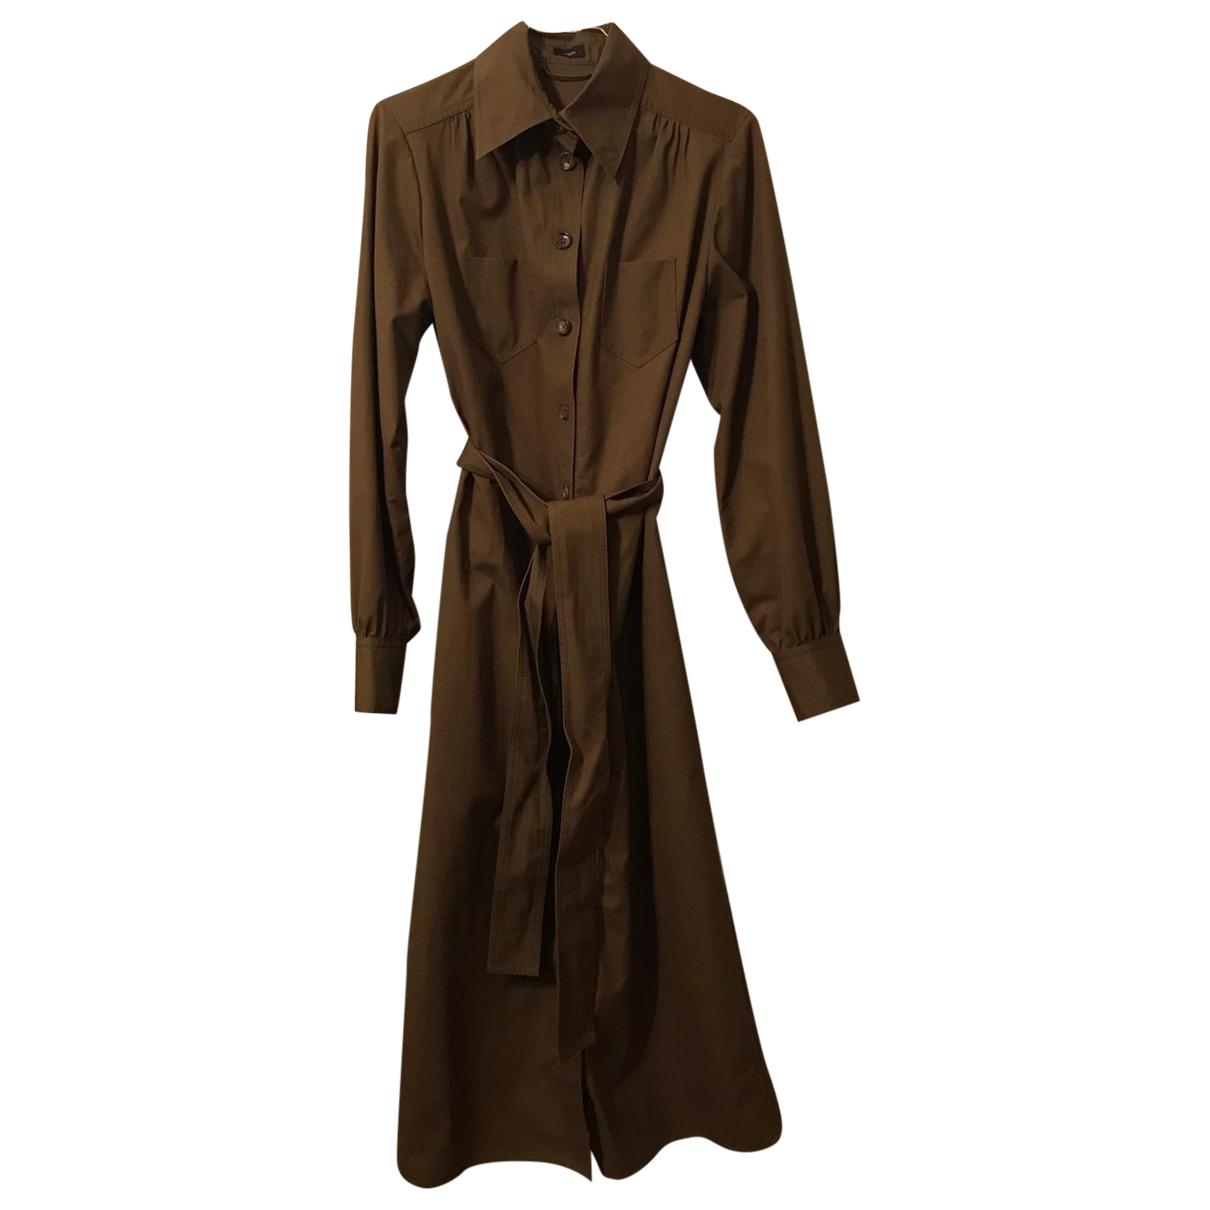 Joseph \N Khaki Cotton dress for Women 36 FR